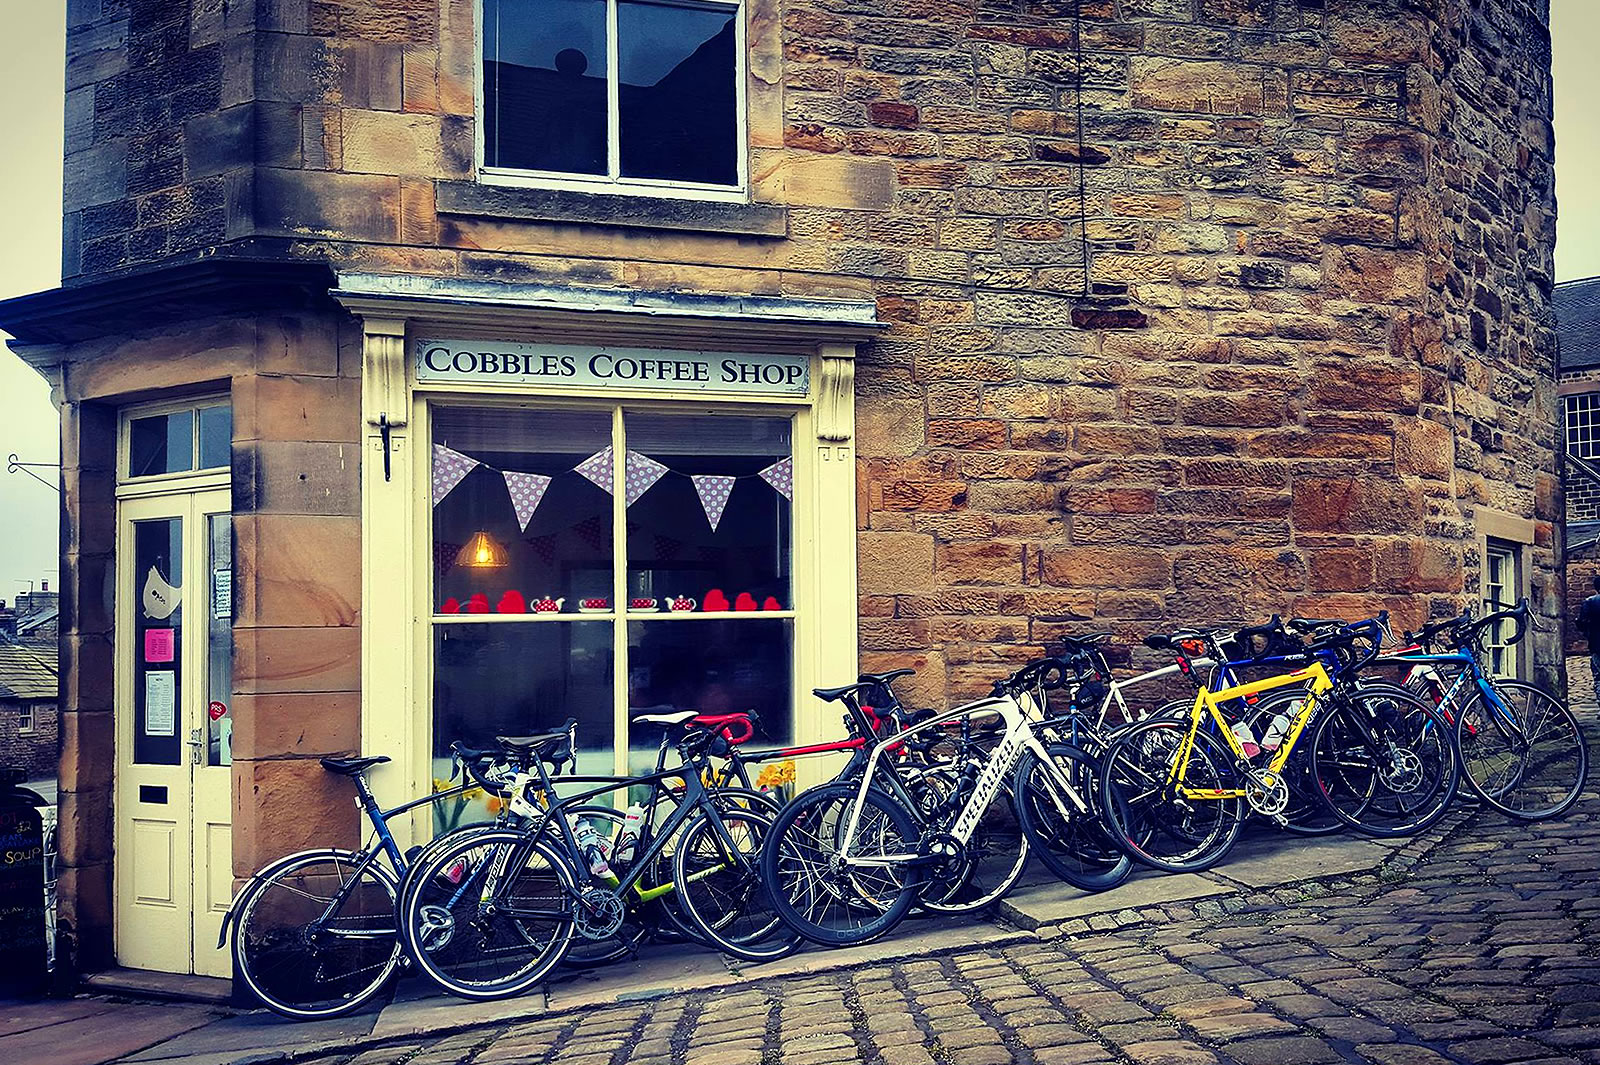 Cobbles Tea and Coffee Shop in Longnor